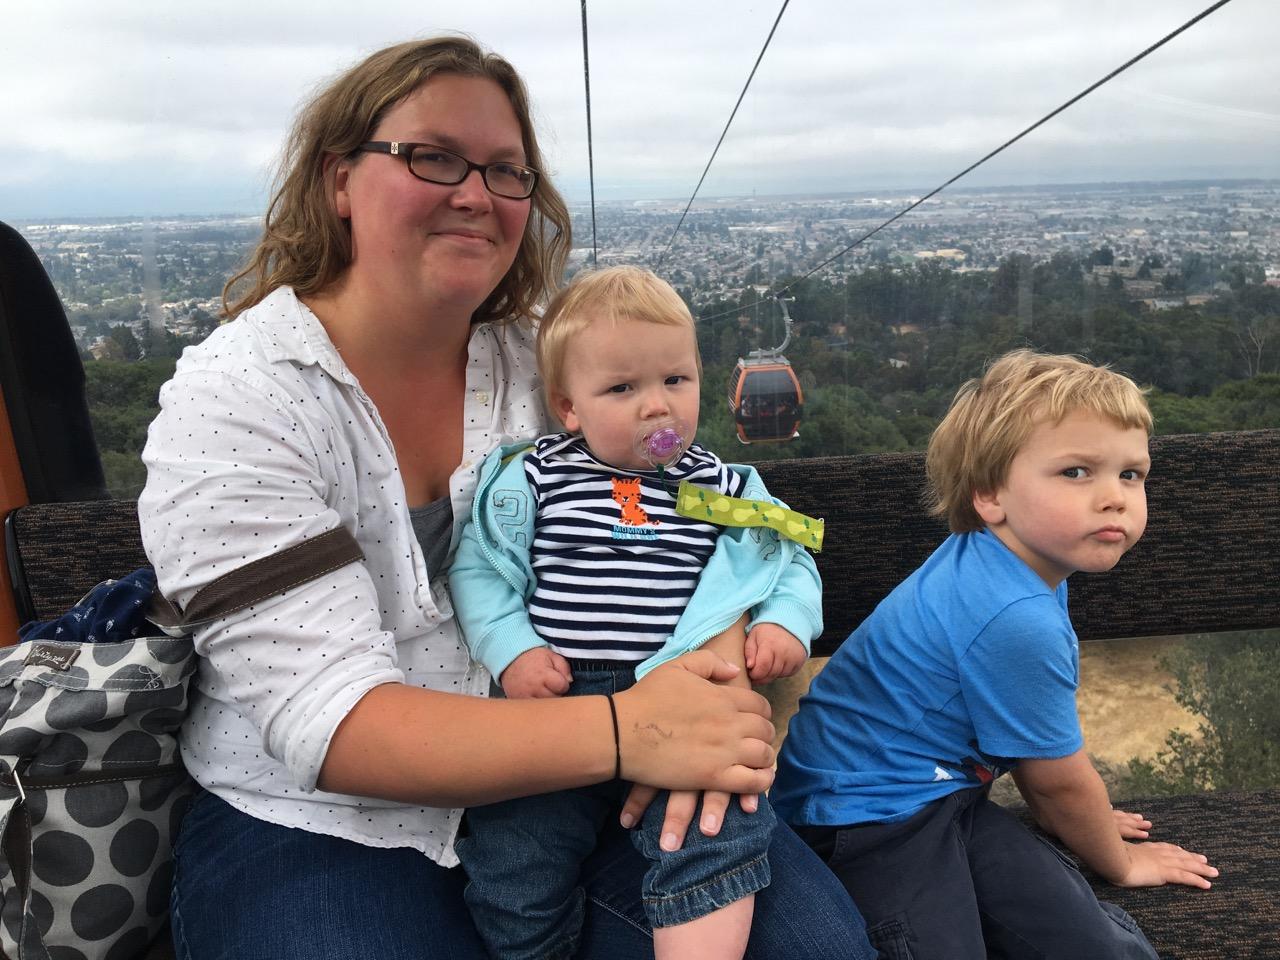 Riding the gondolas at the zoo